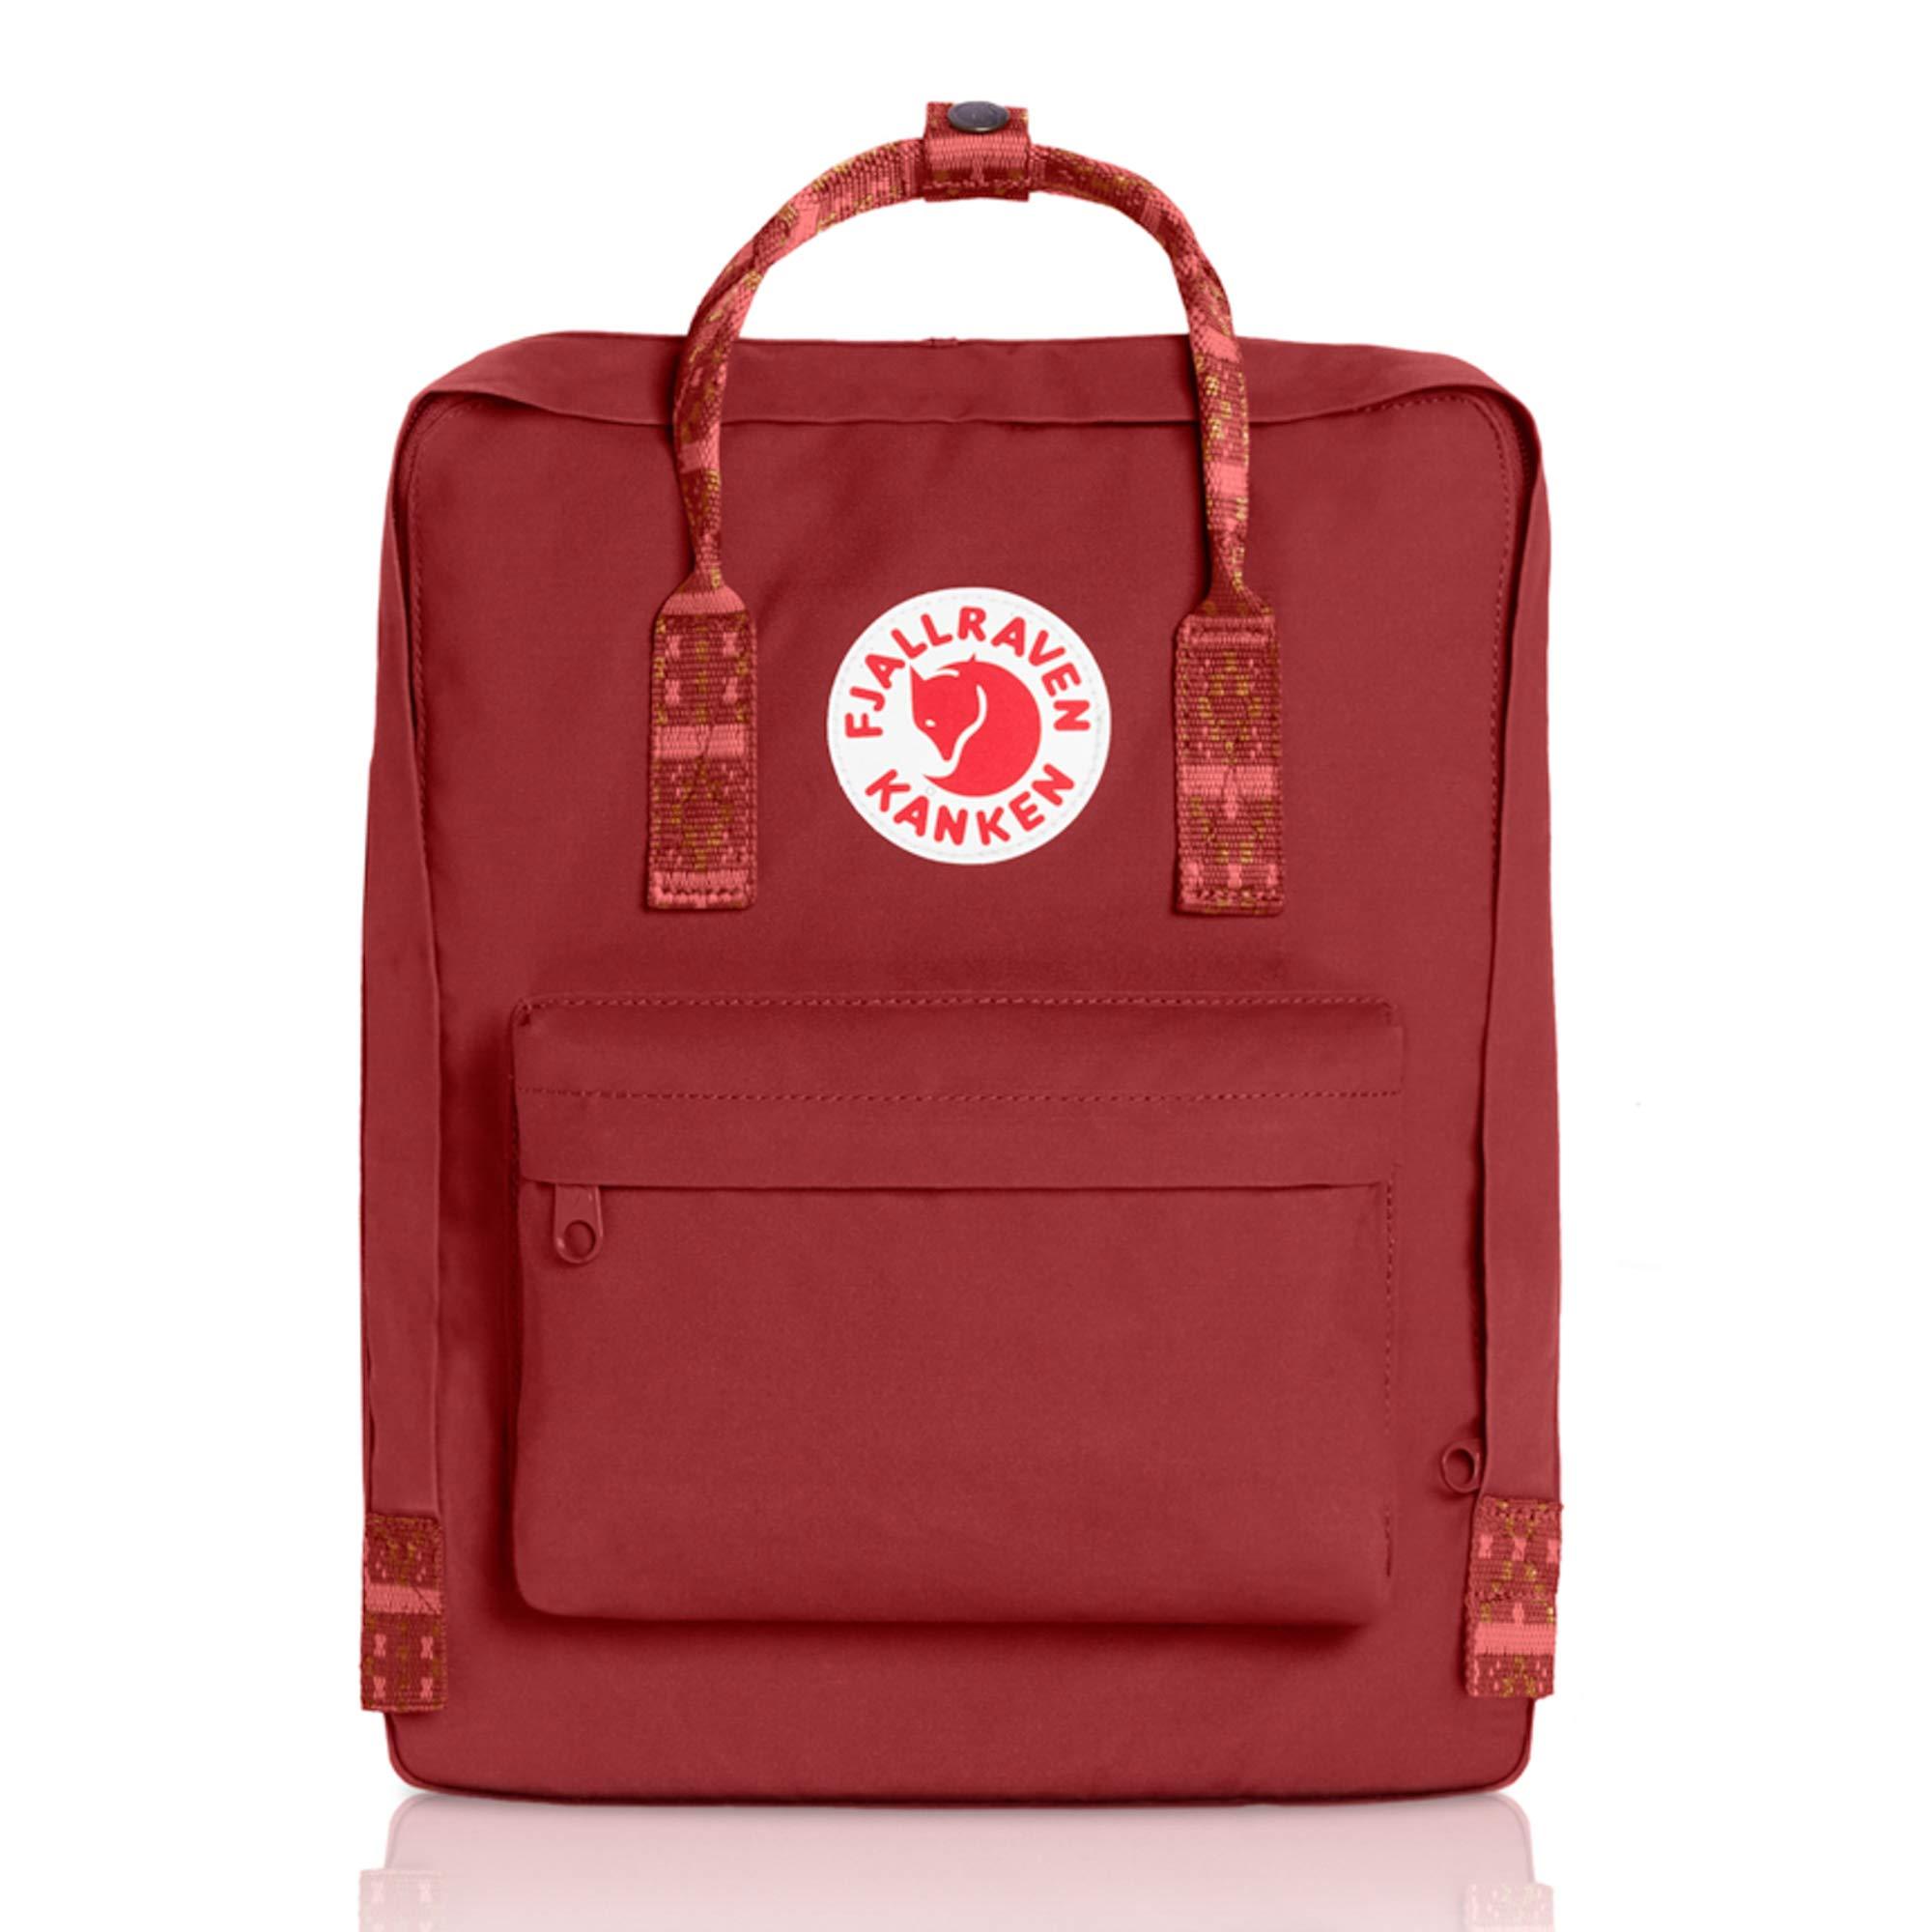 Fjallraven - Kanken Classic Backpack for Everyday, Deep Red/Folk Pattern by Fjallraven